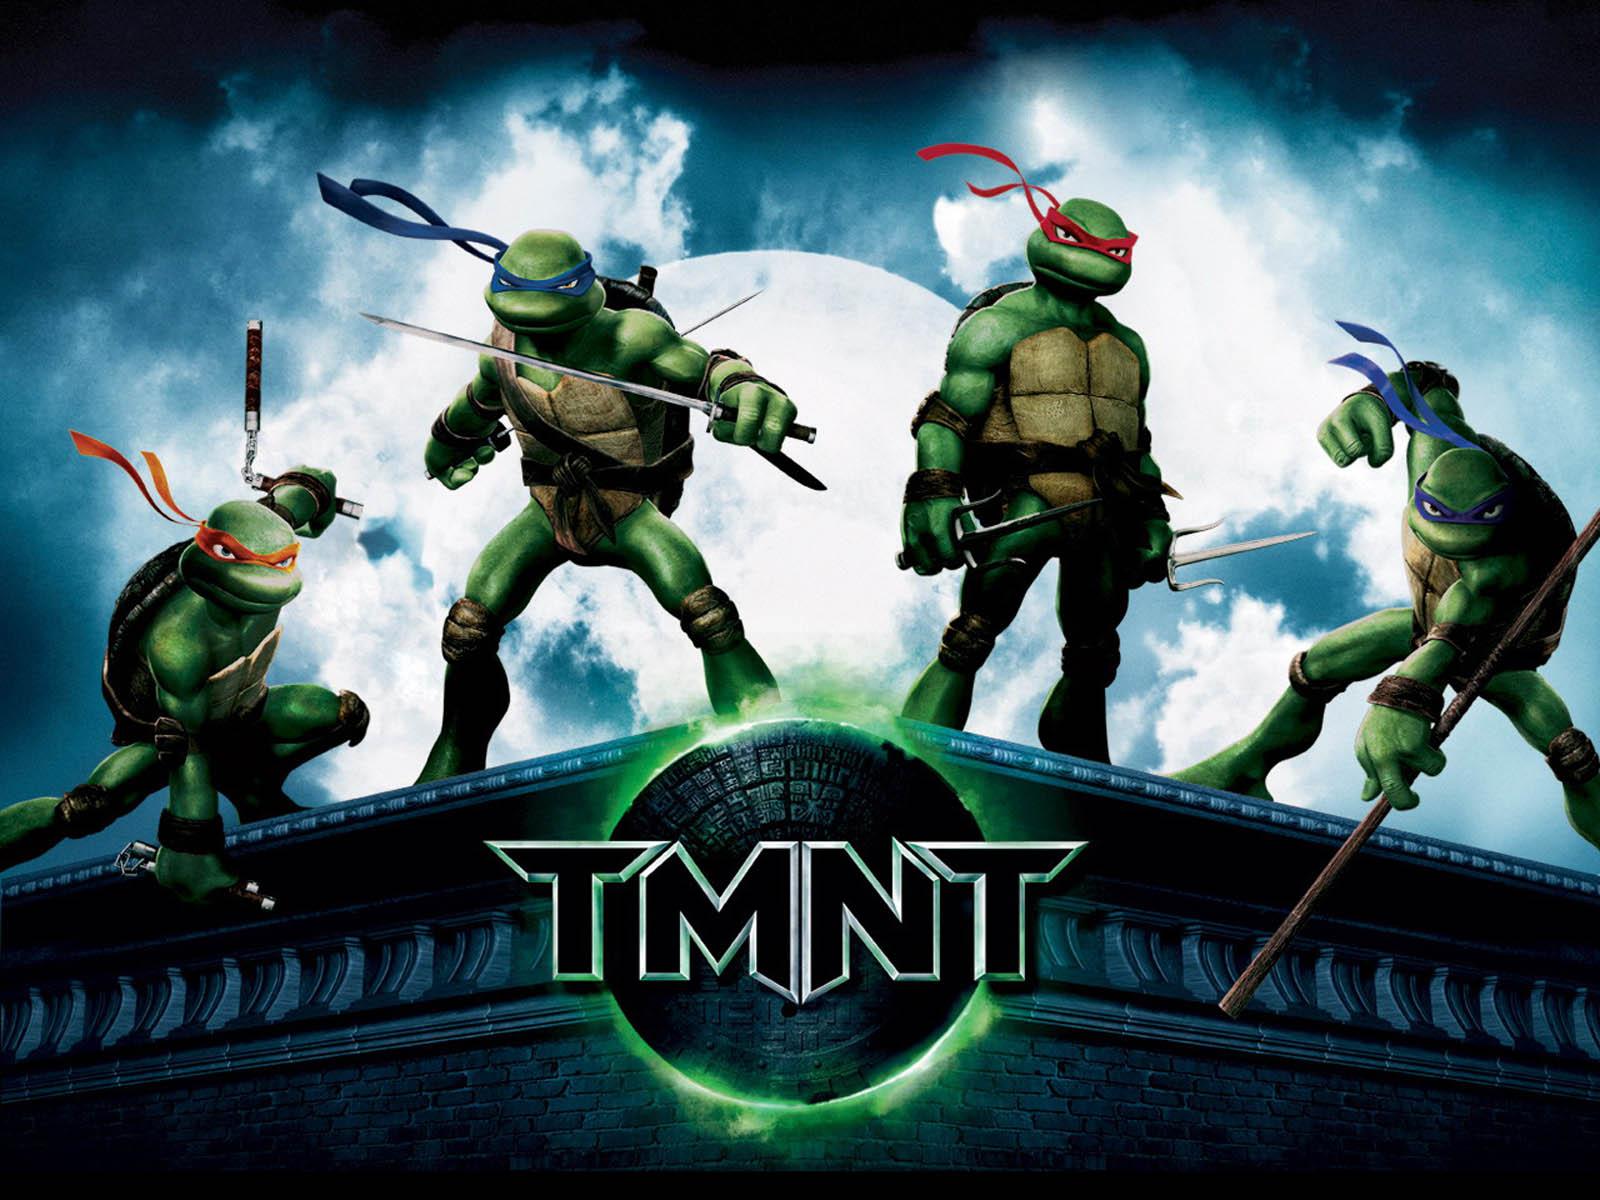 Cartoon - TMNT  Michelangelo Leonardo (TMNT) Donatello (TMNT) Raphael (TMNT) Wallpaper